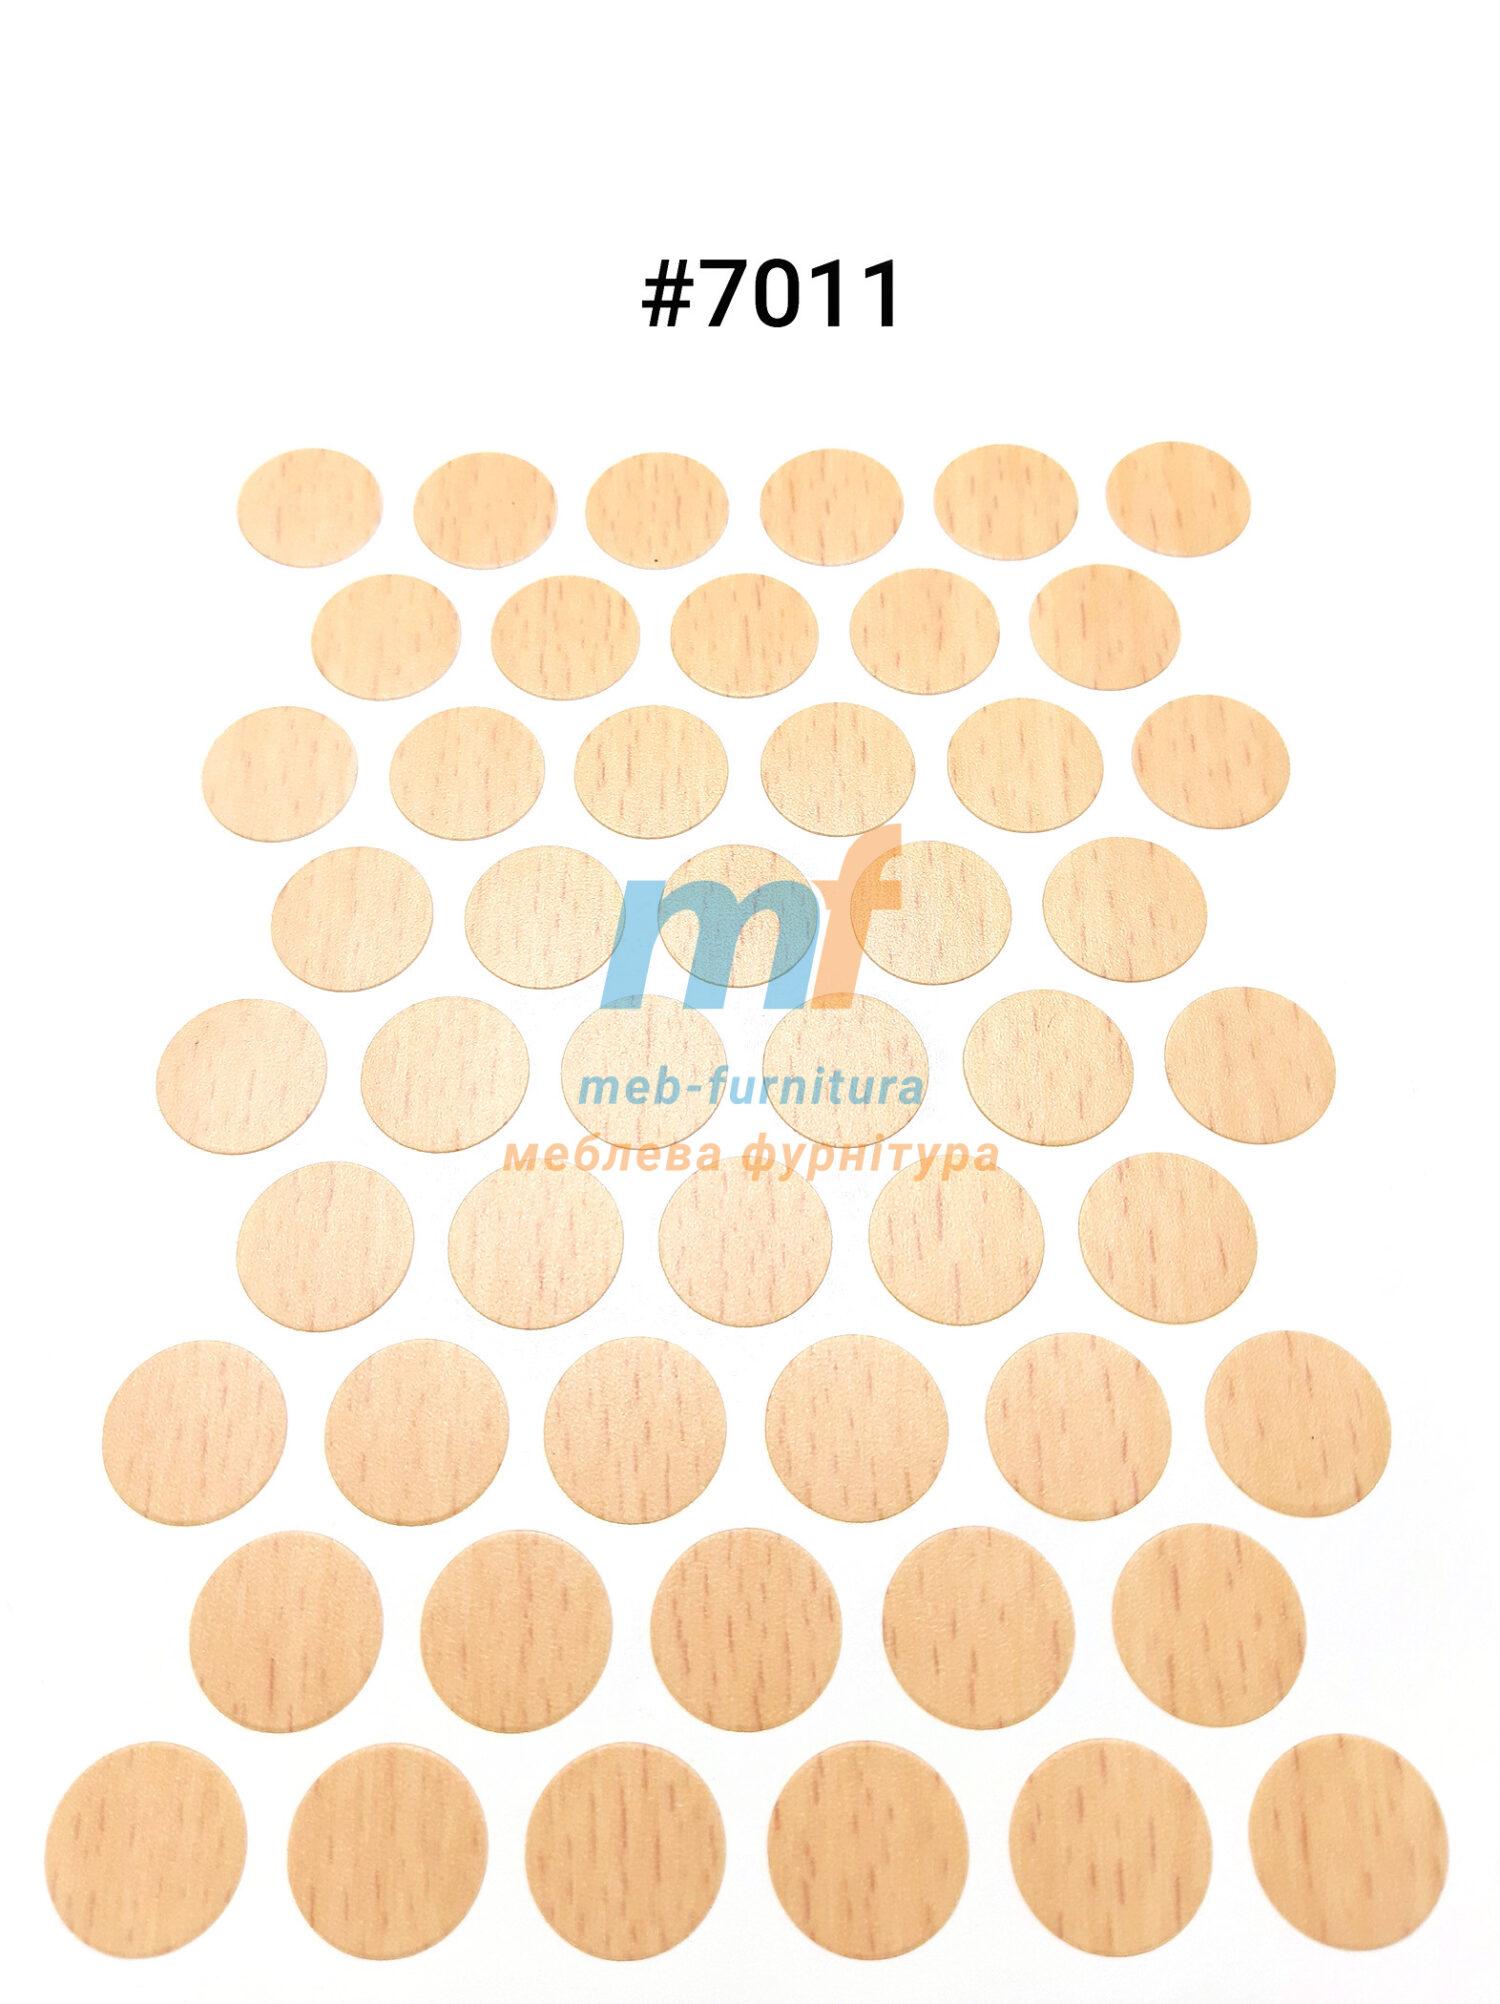 Заглушка на самоклейке для конфирмата,шурупа (7011)